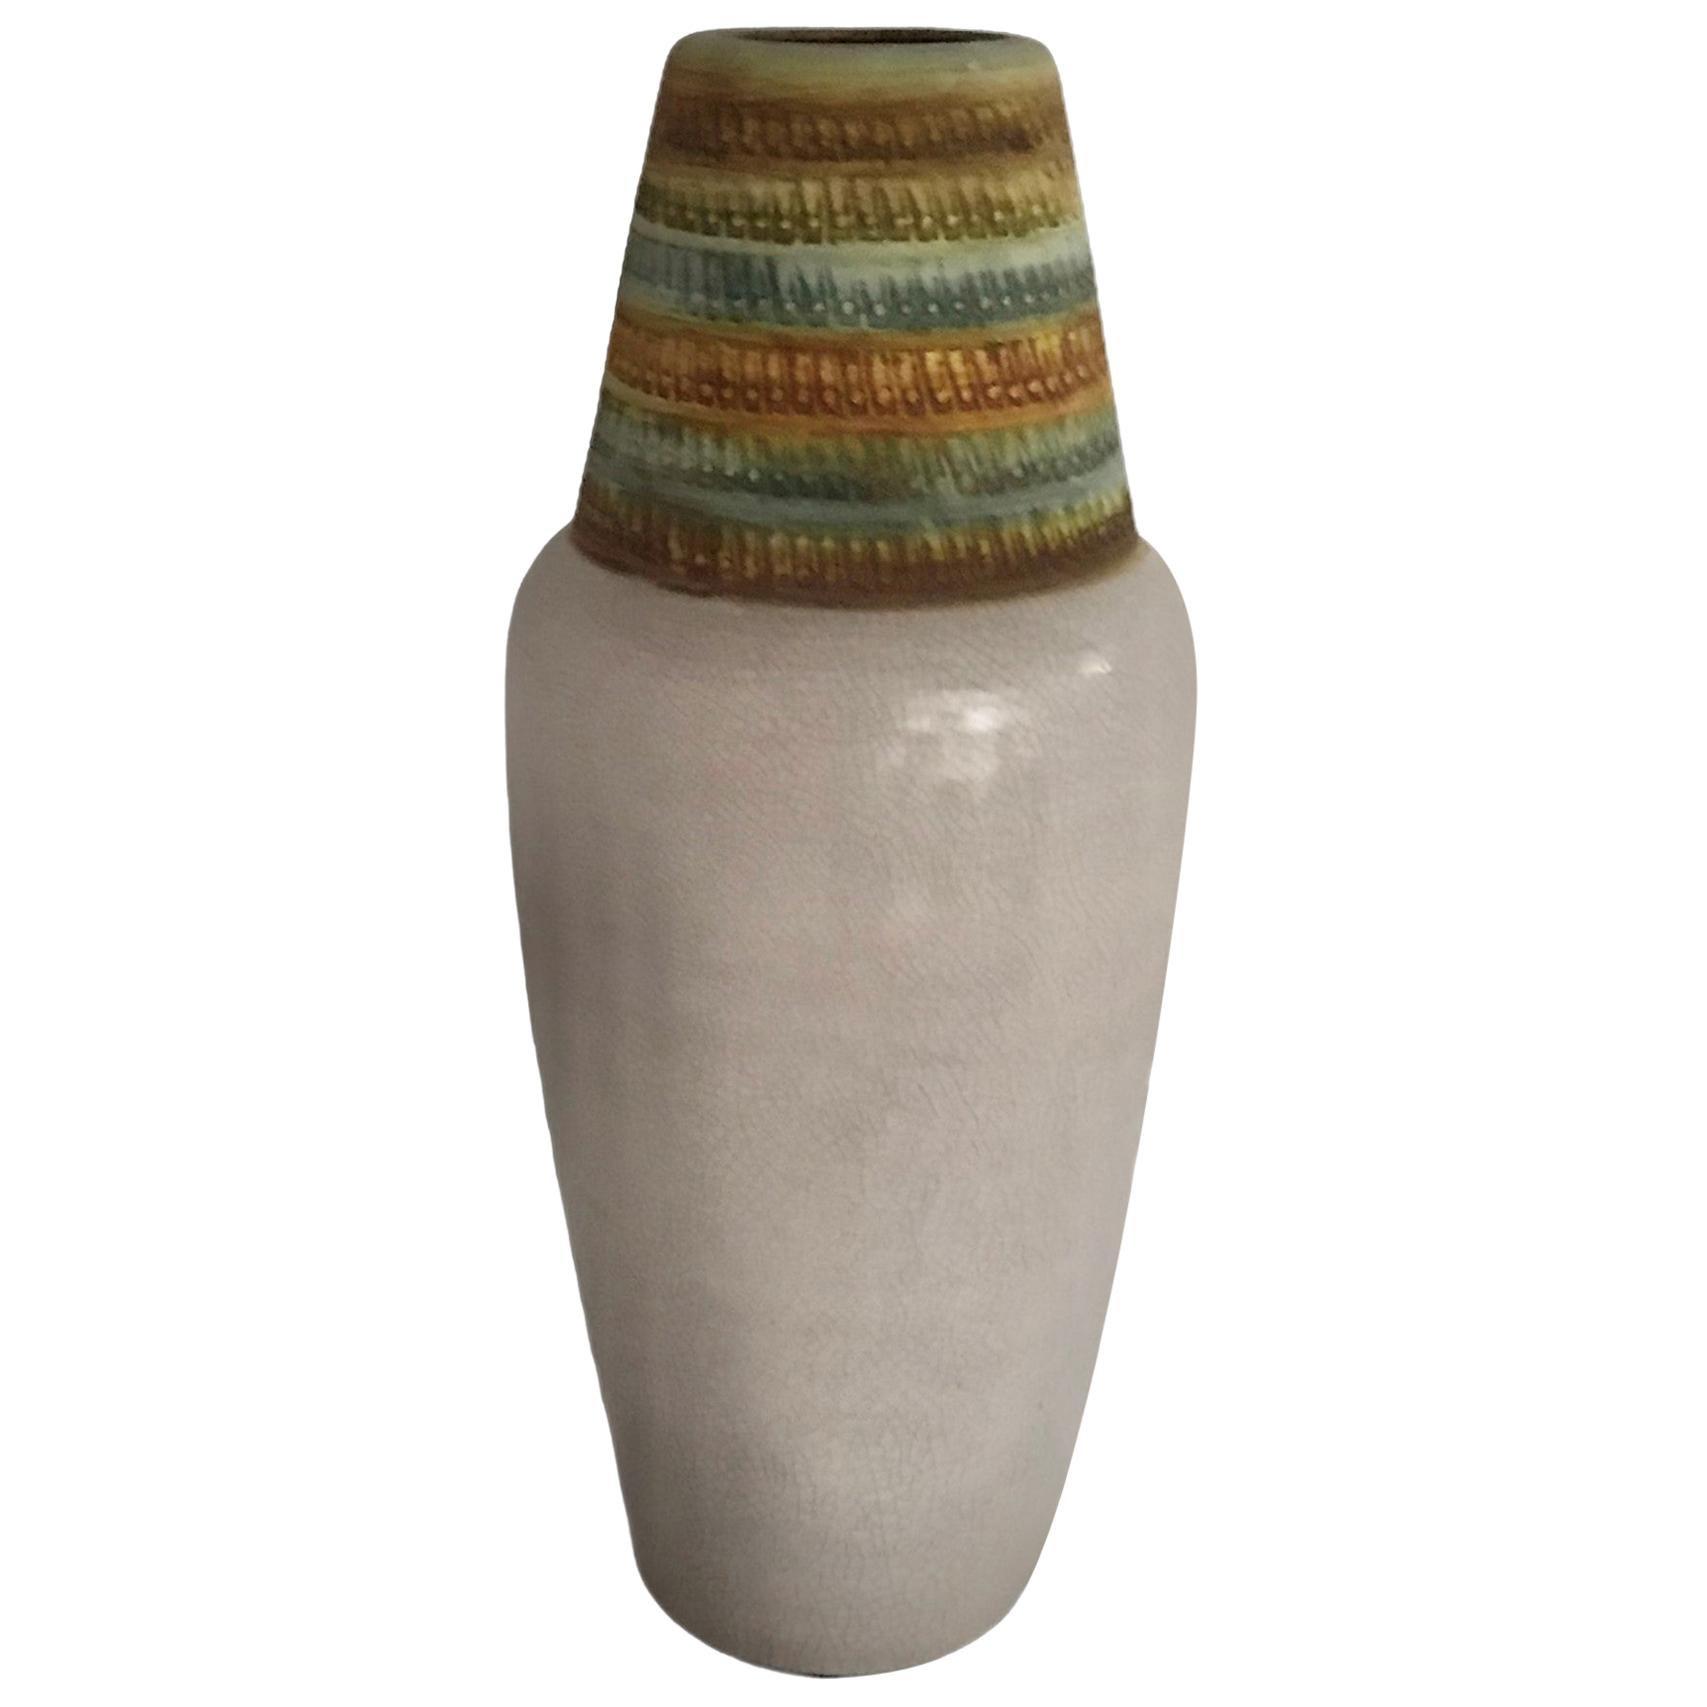 1960s Tall Alvino Bagni Italian Modern Ceramic Vase for Bitossi